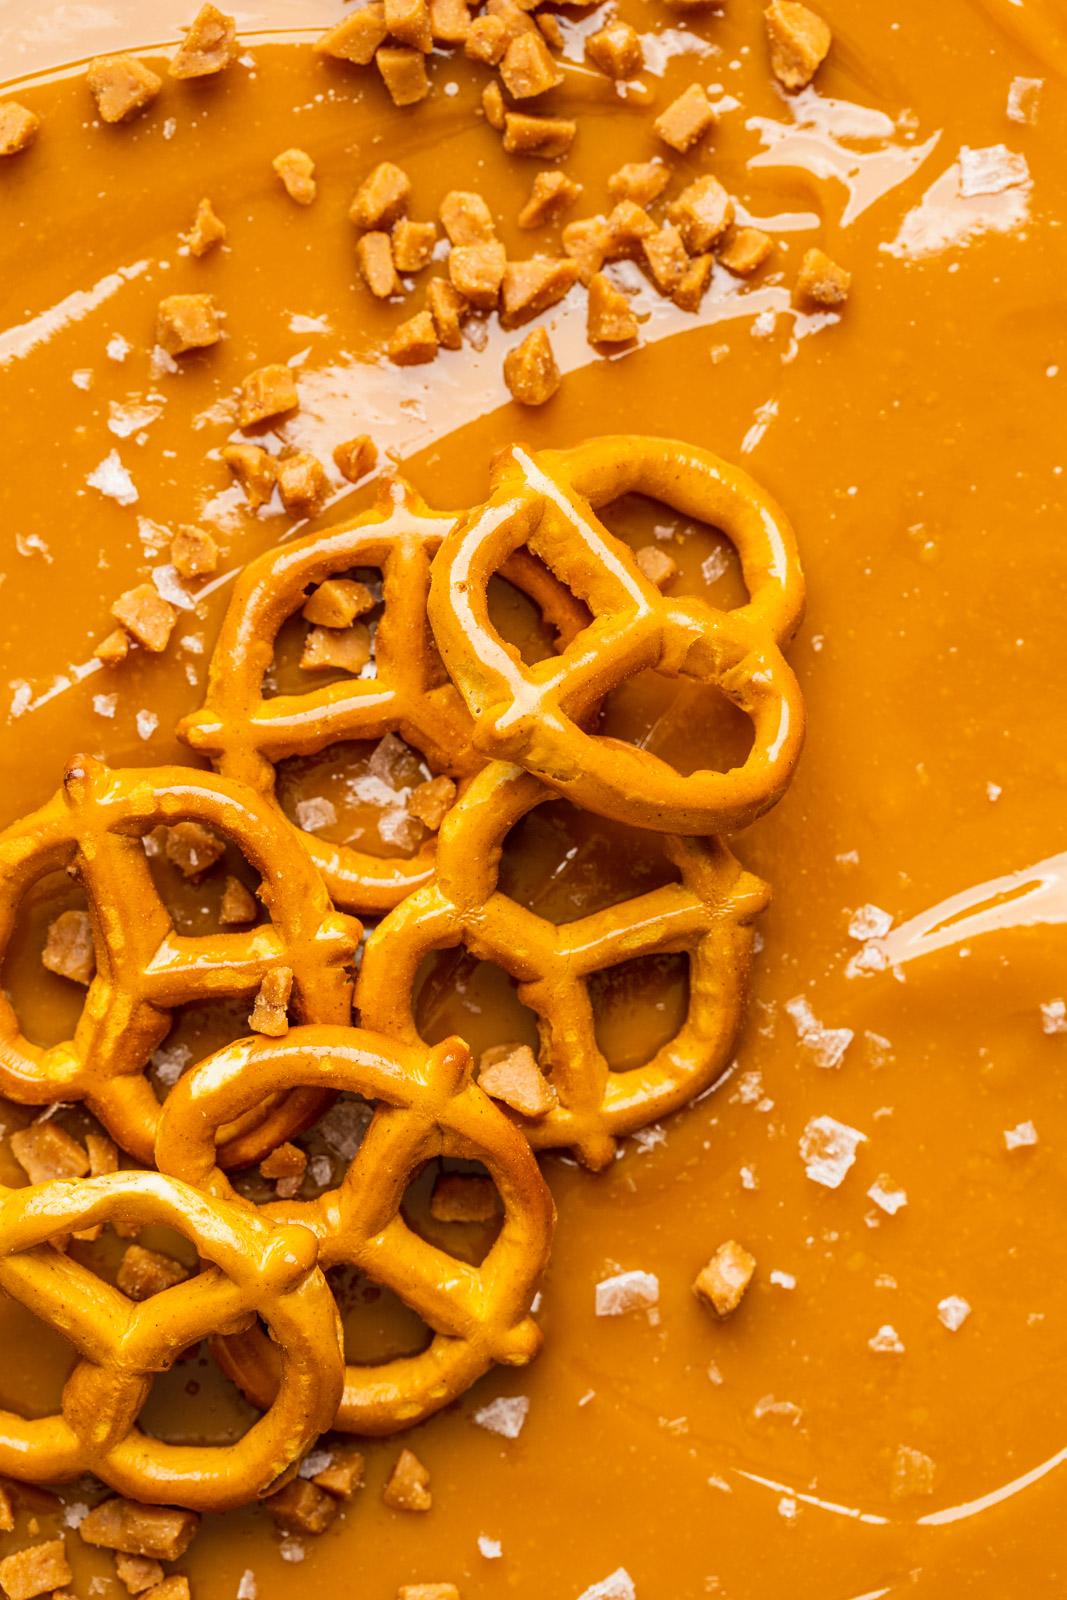 Caramel Cheesecake With a Pretzel Crust